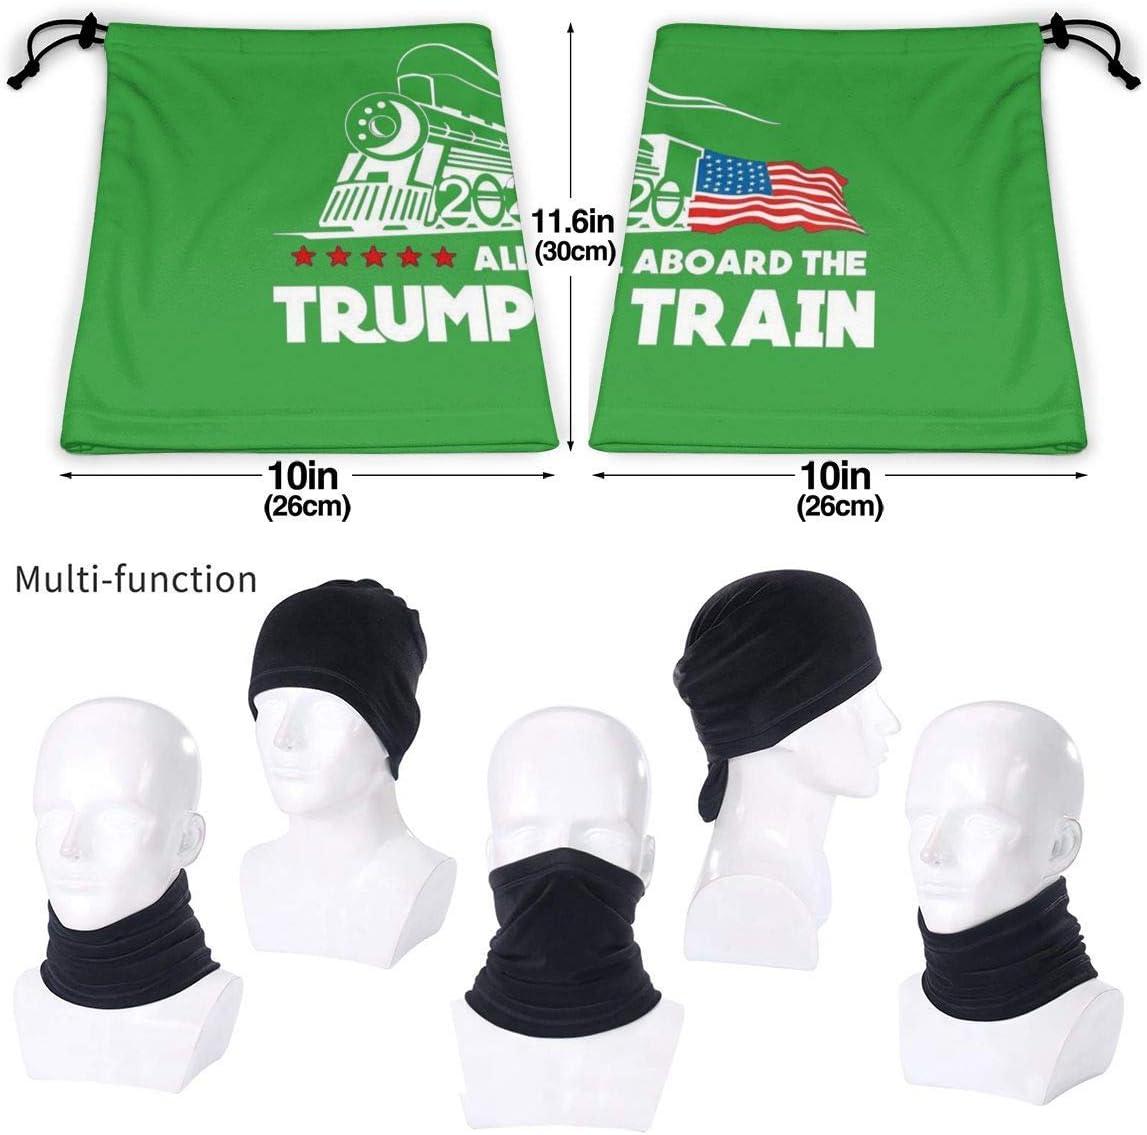 All Aboard The Trump Train 2020 Microfiber Neck Warmer Scarf Gaiter Headwear Face Mask Bandanas